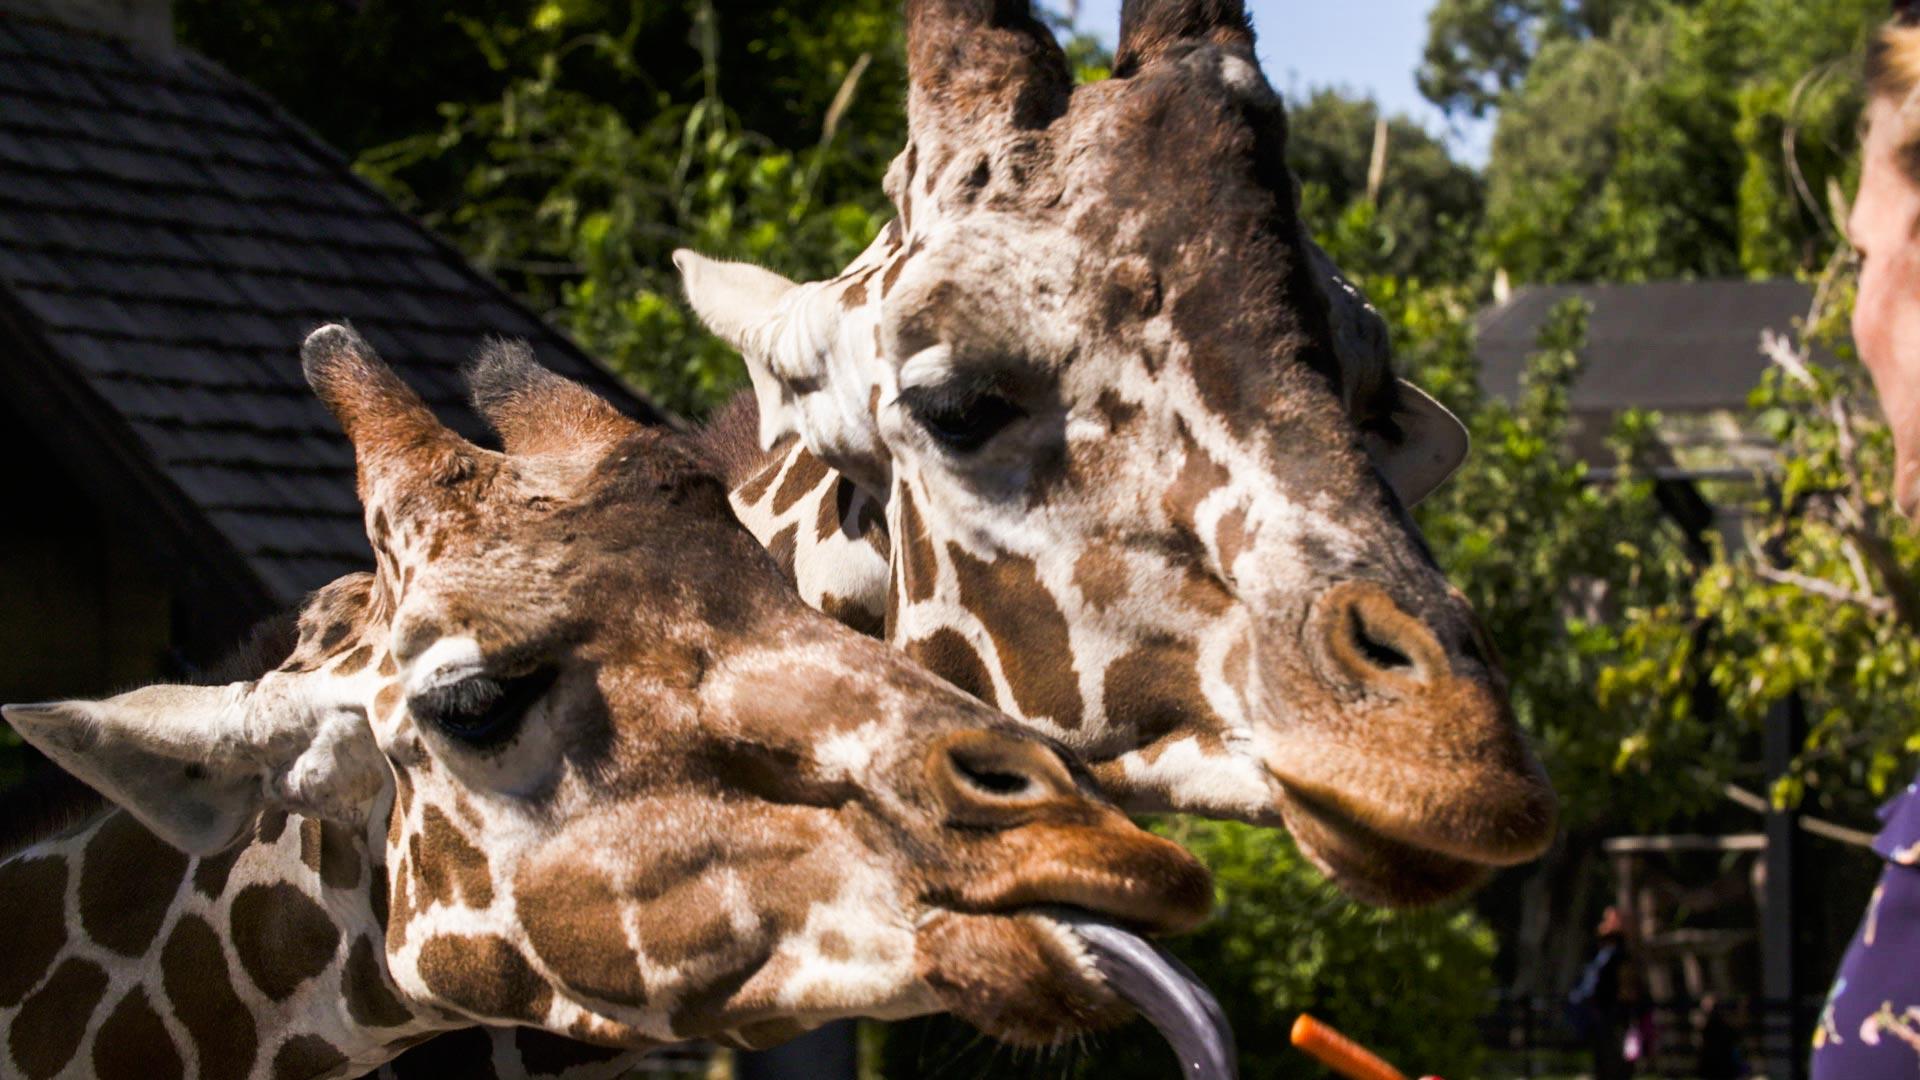 Giraffes at the Reid Park Zoo.